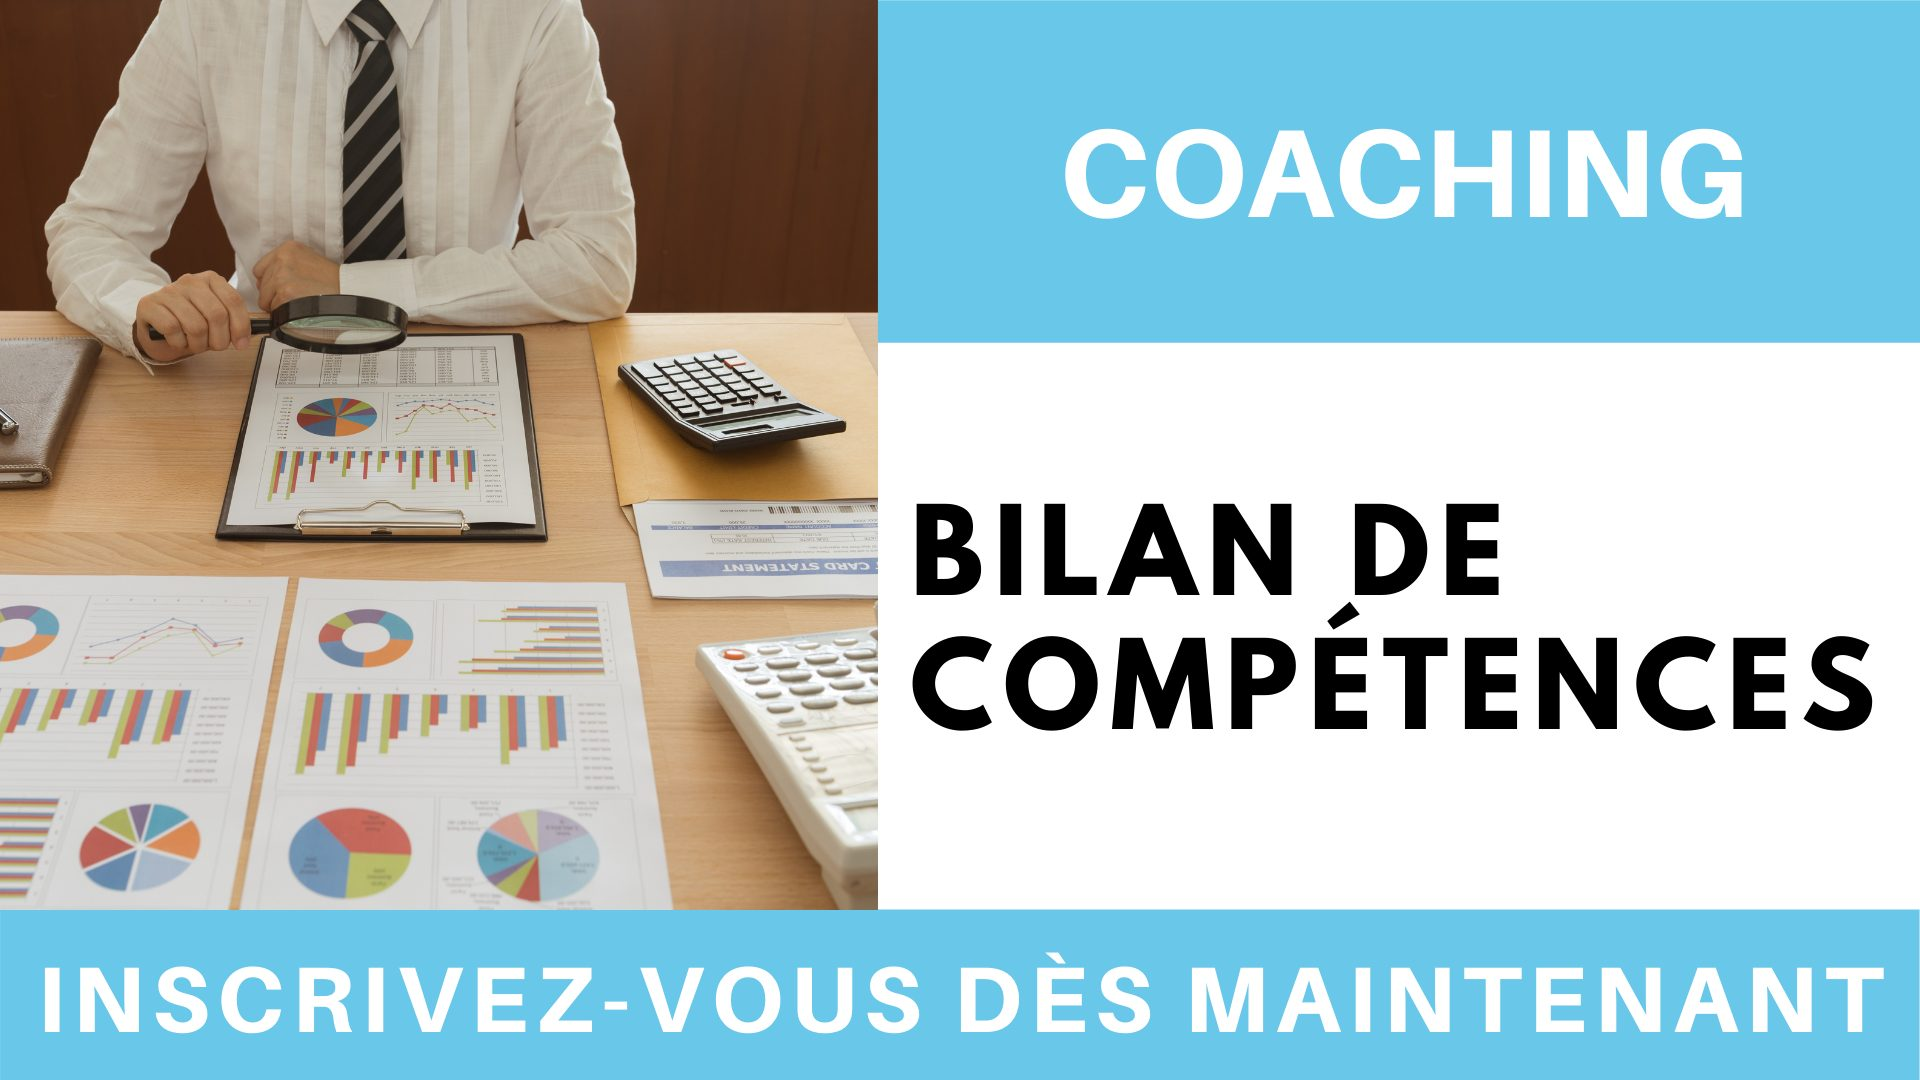 Coaching Bilan de compétences